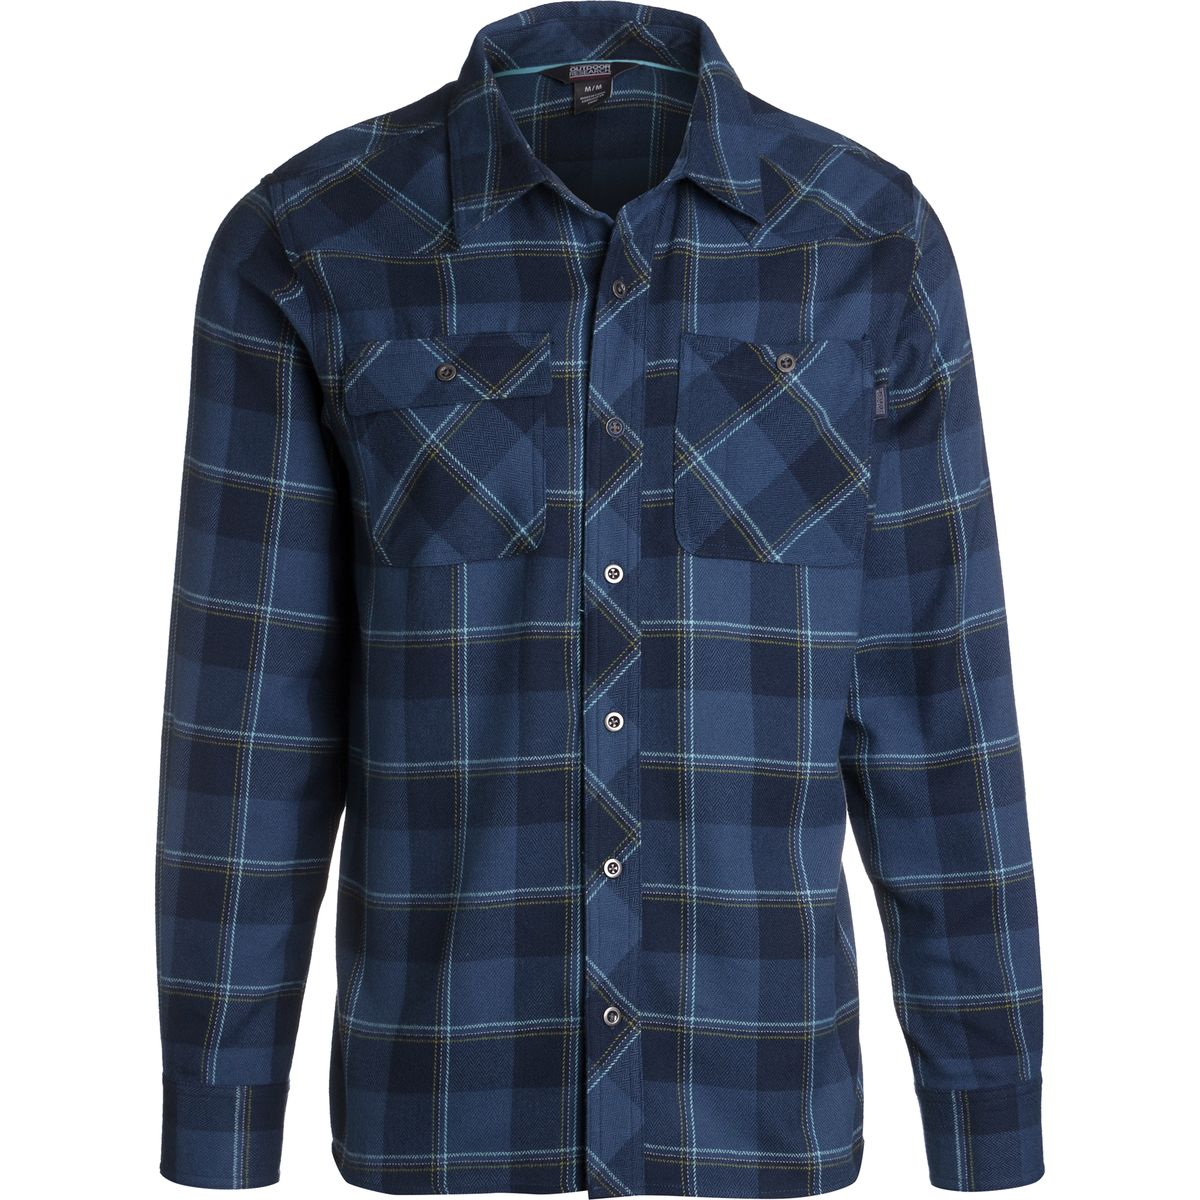 Outdoor Research Feedback Flannel Shirt - Men